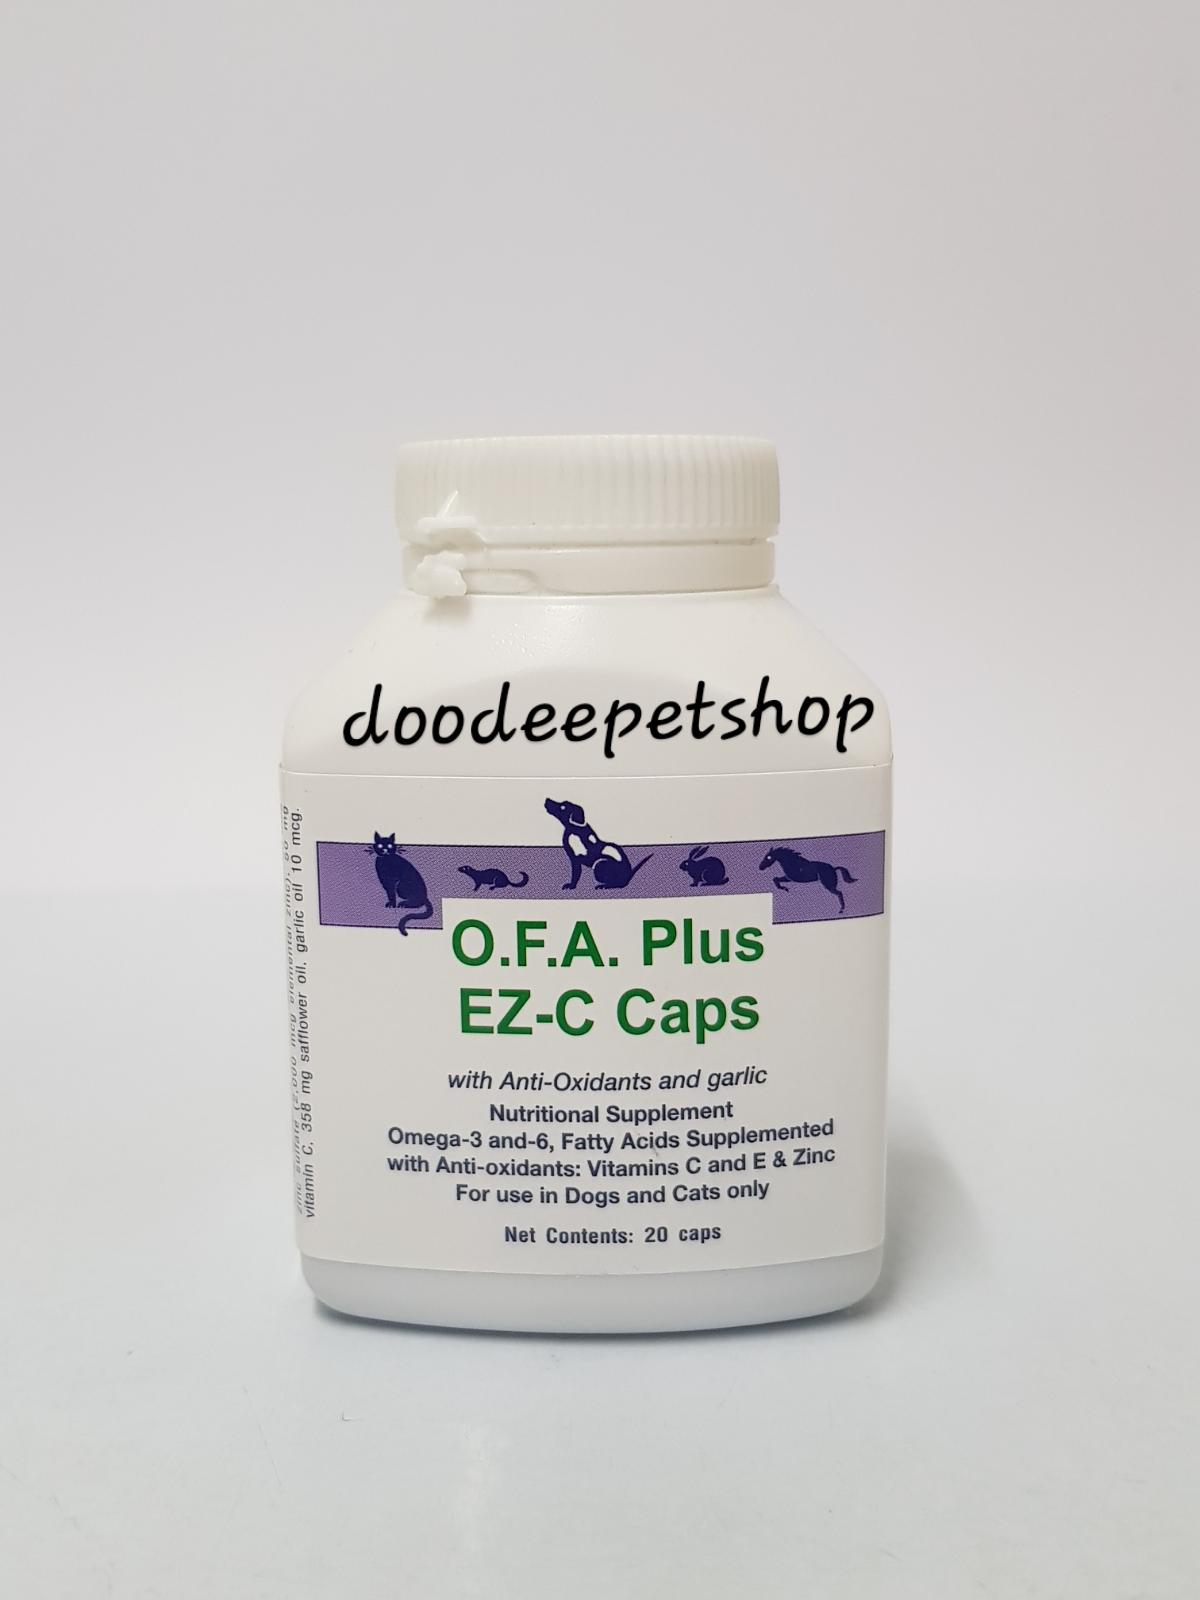 O.F.A. Plus EZ-C Caps จำนวน 20 เม็ด สำหรับสุนัขและแมว